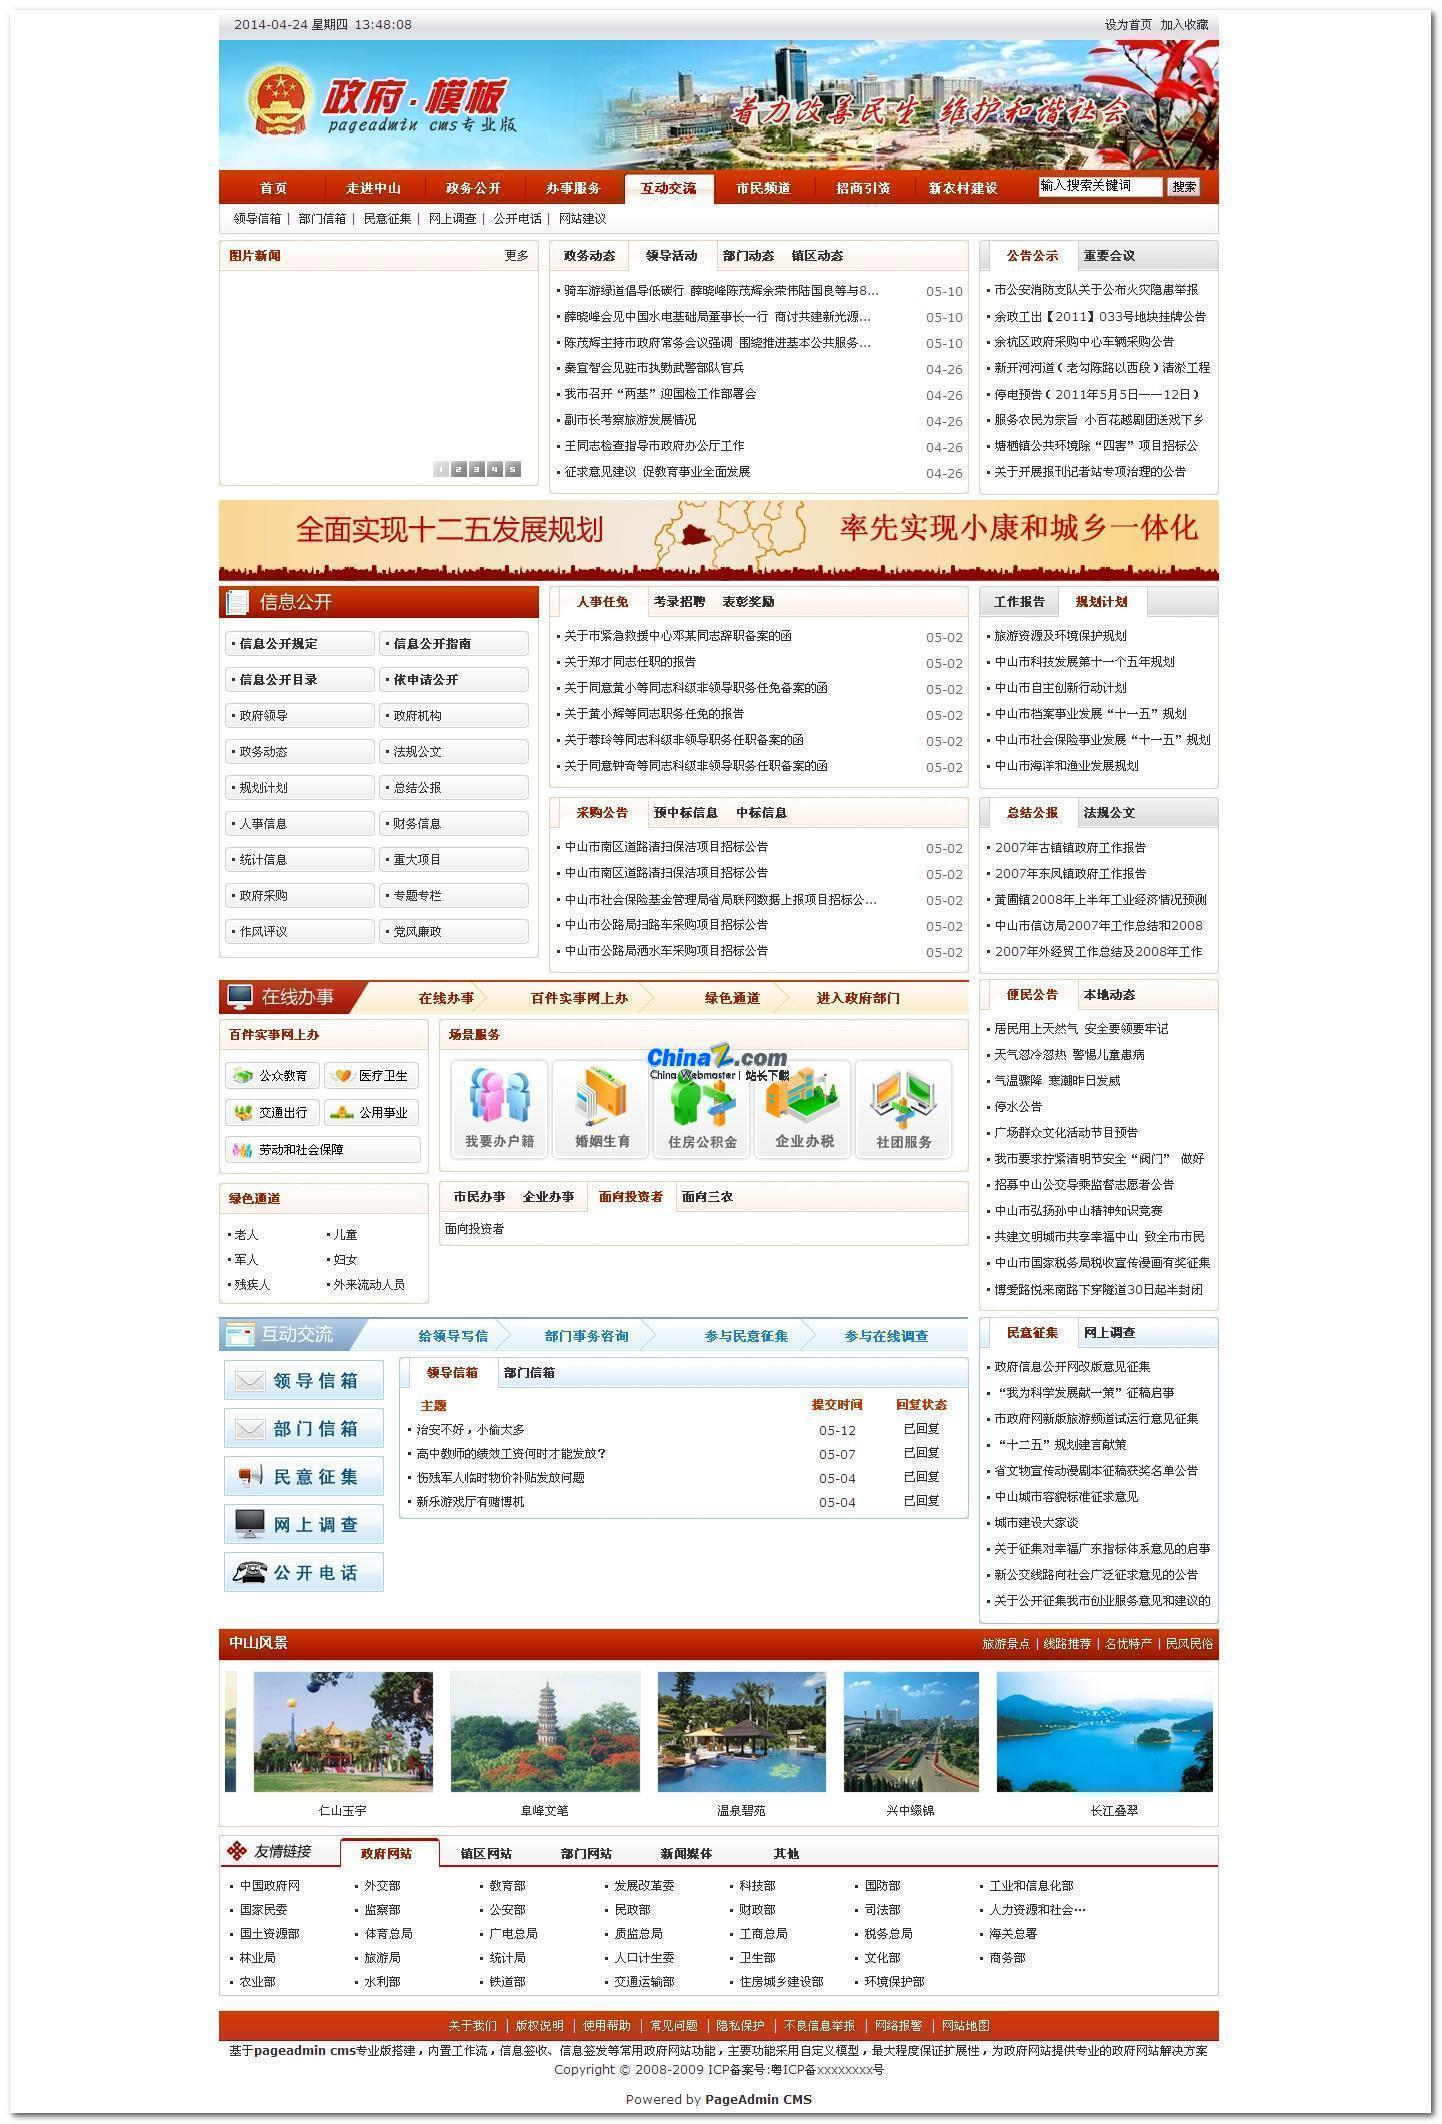 PageAdmin政府网站管理系统